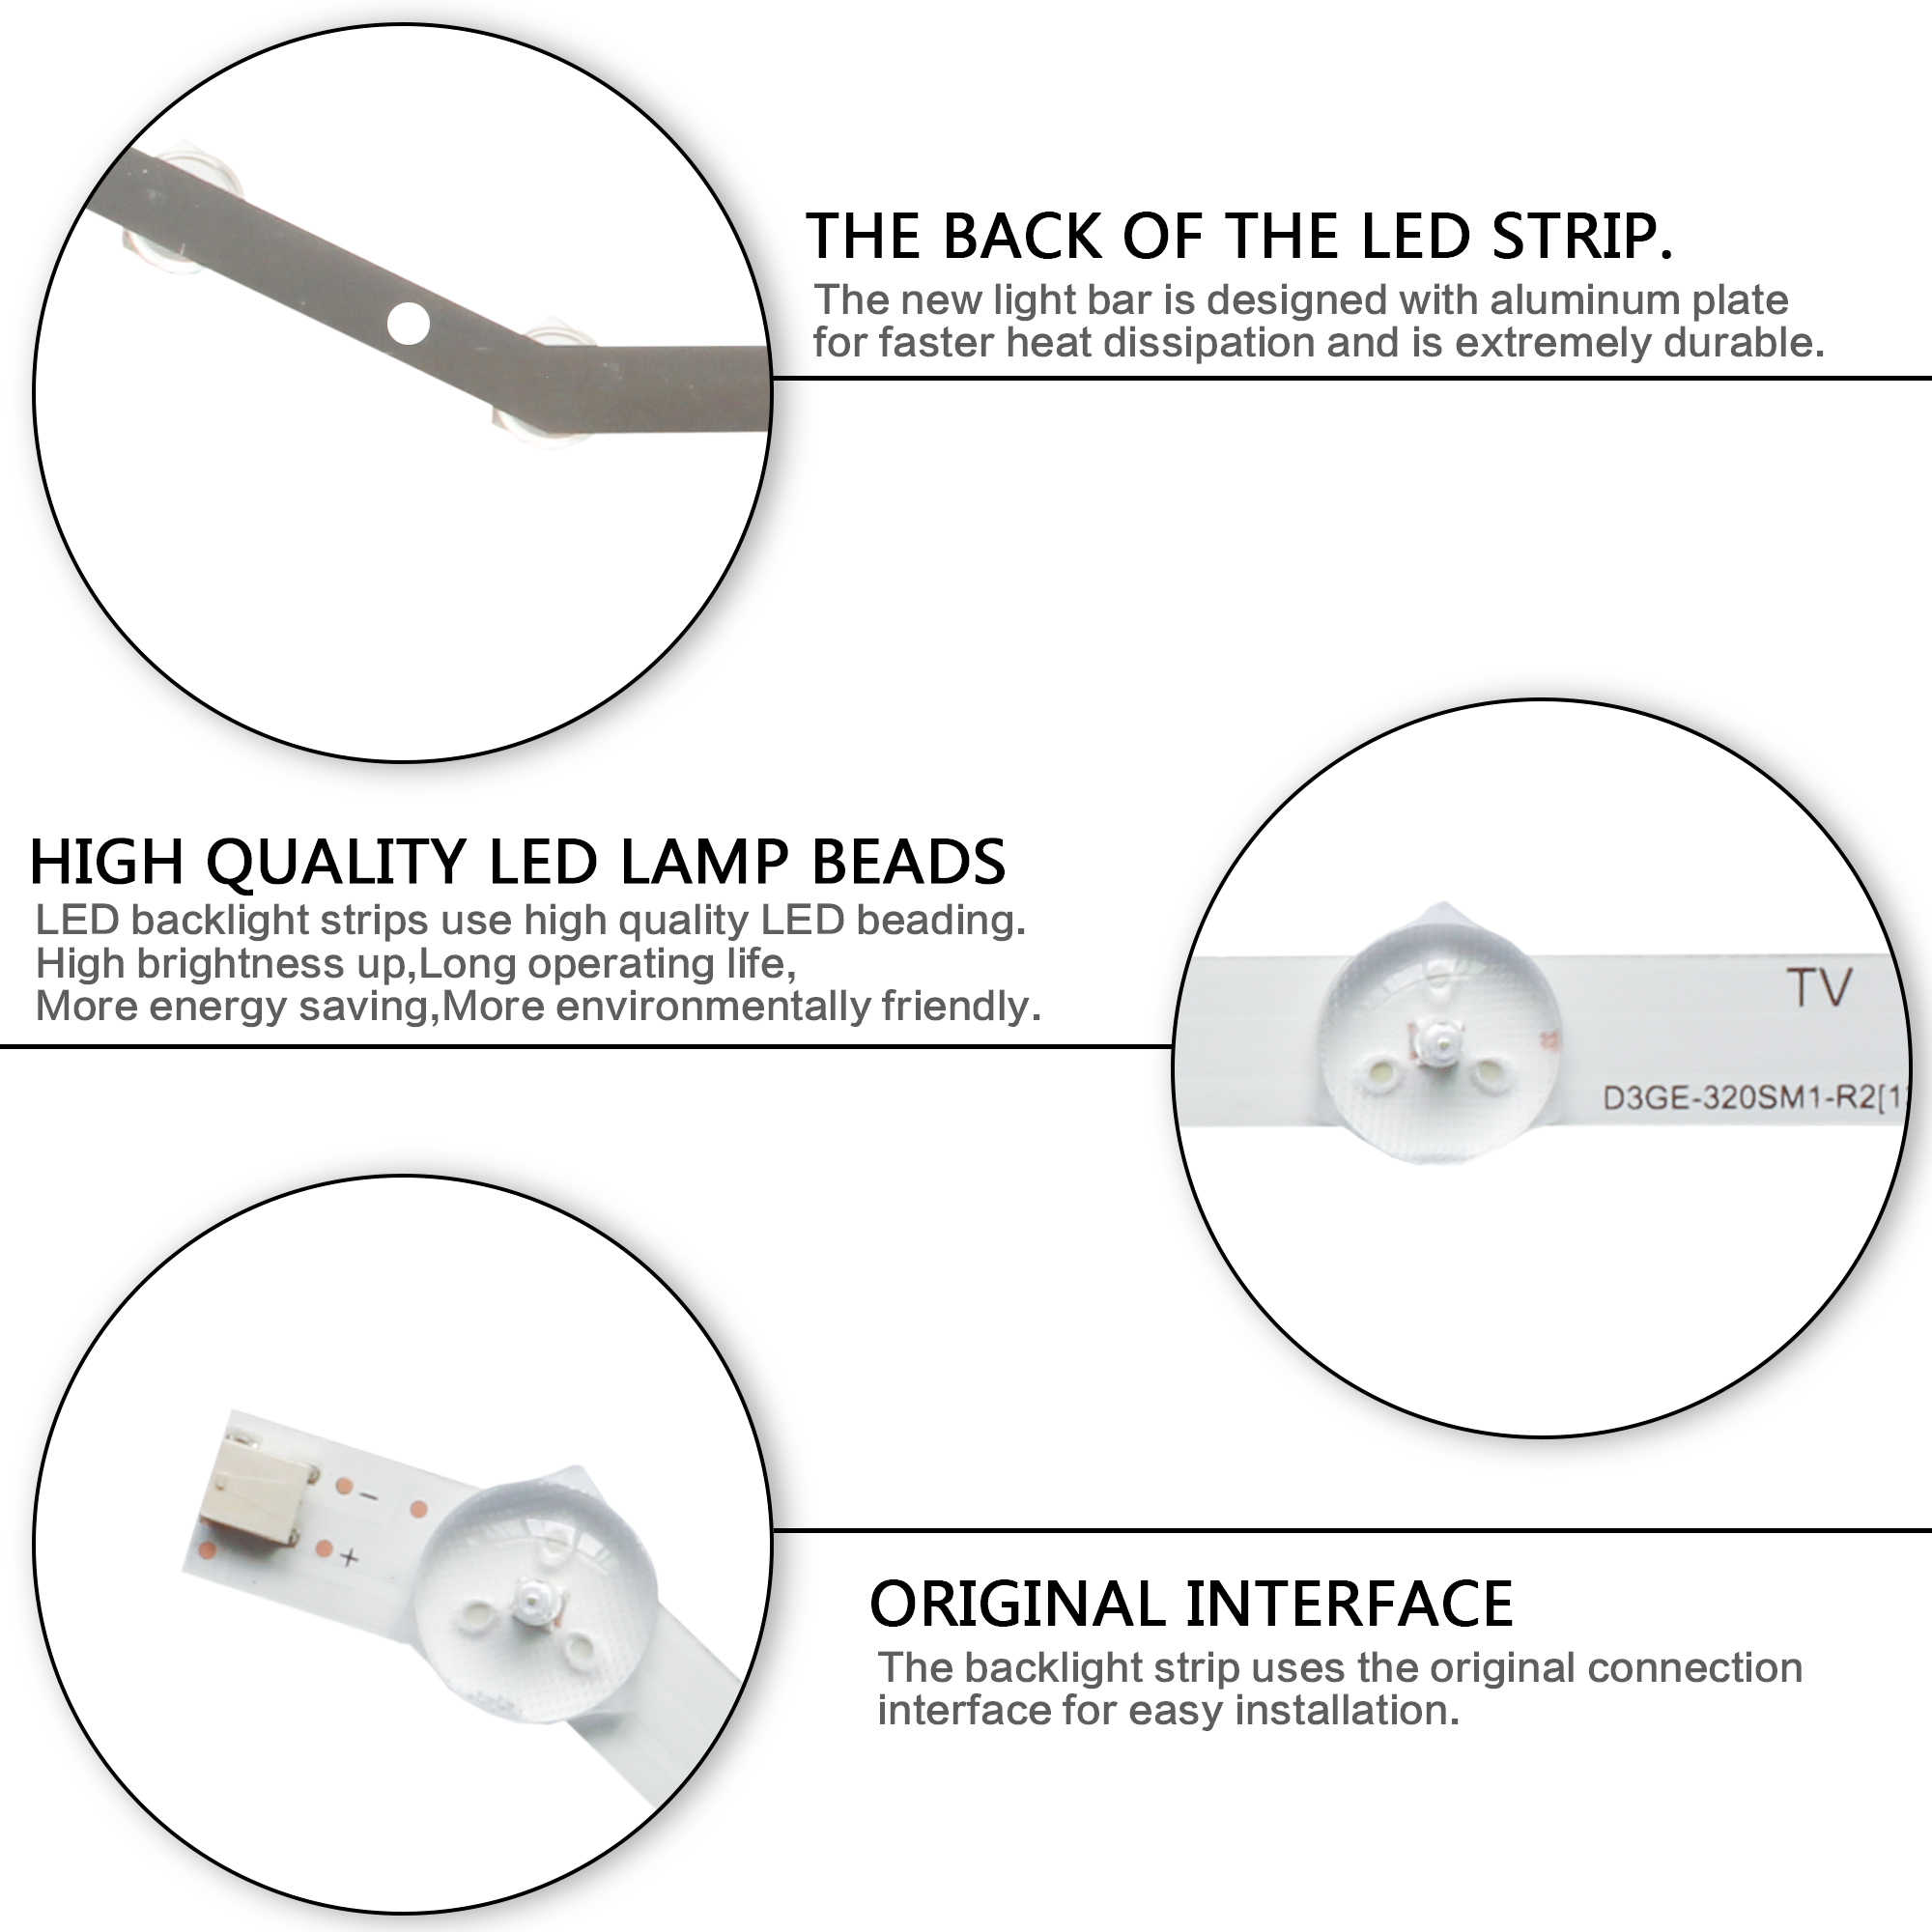 "Led Backlight Strip 12 Leds Voor Samsung 32 ""Tv D3GE-320SM1-R2 CY-DF320BGLV1H BN96-28763A LM41-00001R 2013VS32 BN96-35204A"